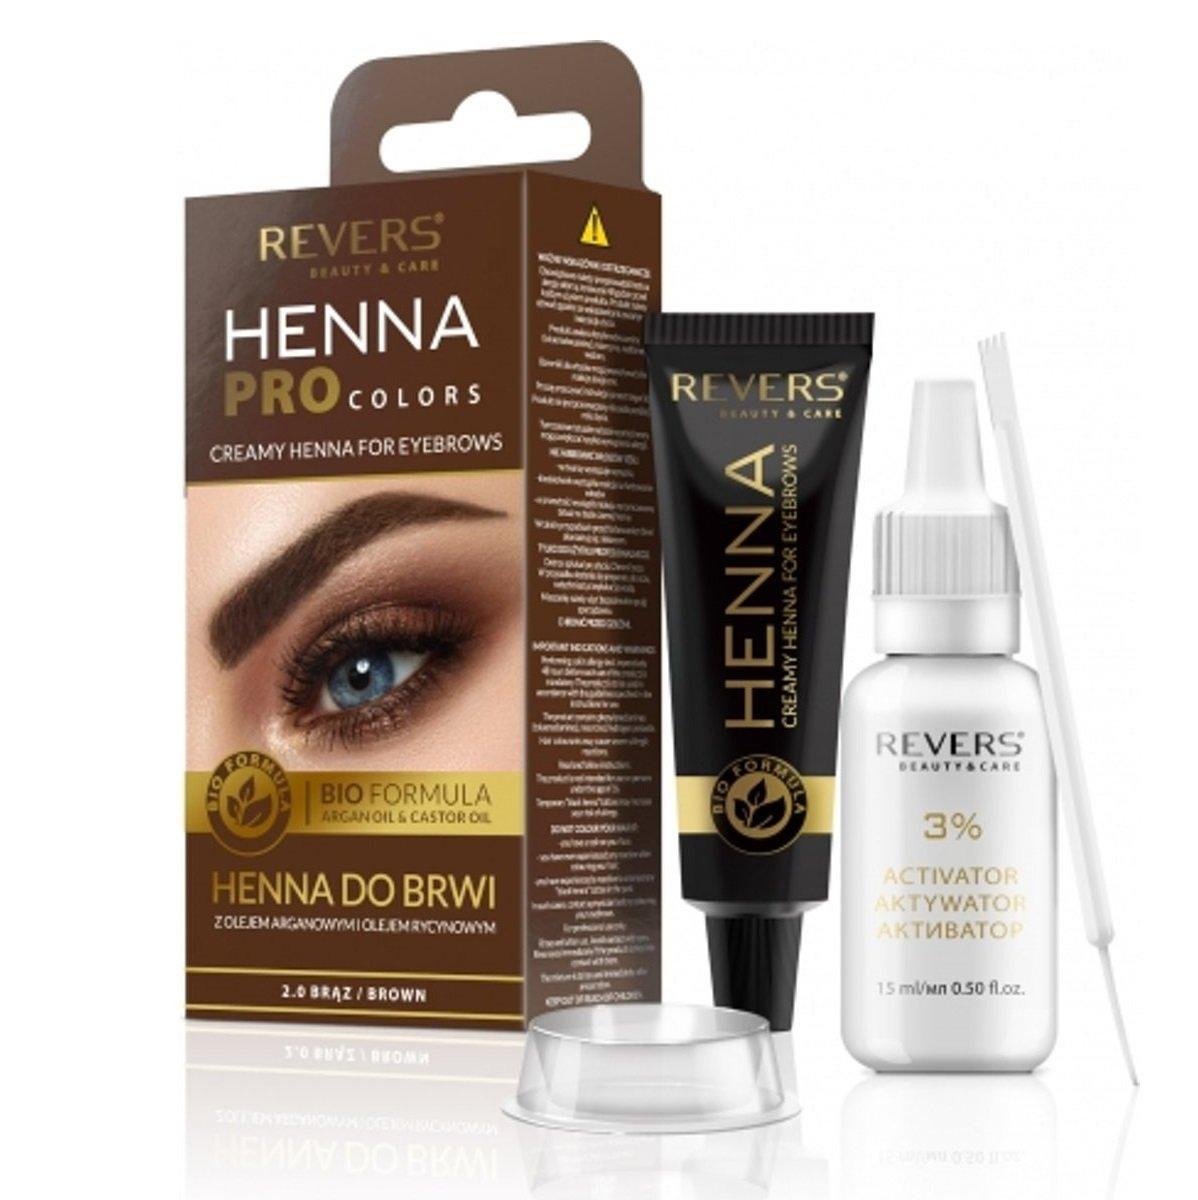 Eyebrow dye Bio Formula Creamy henna with Argan oil & castor oil 2.0 Brown